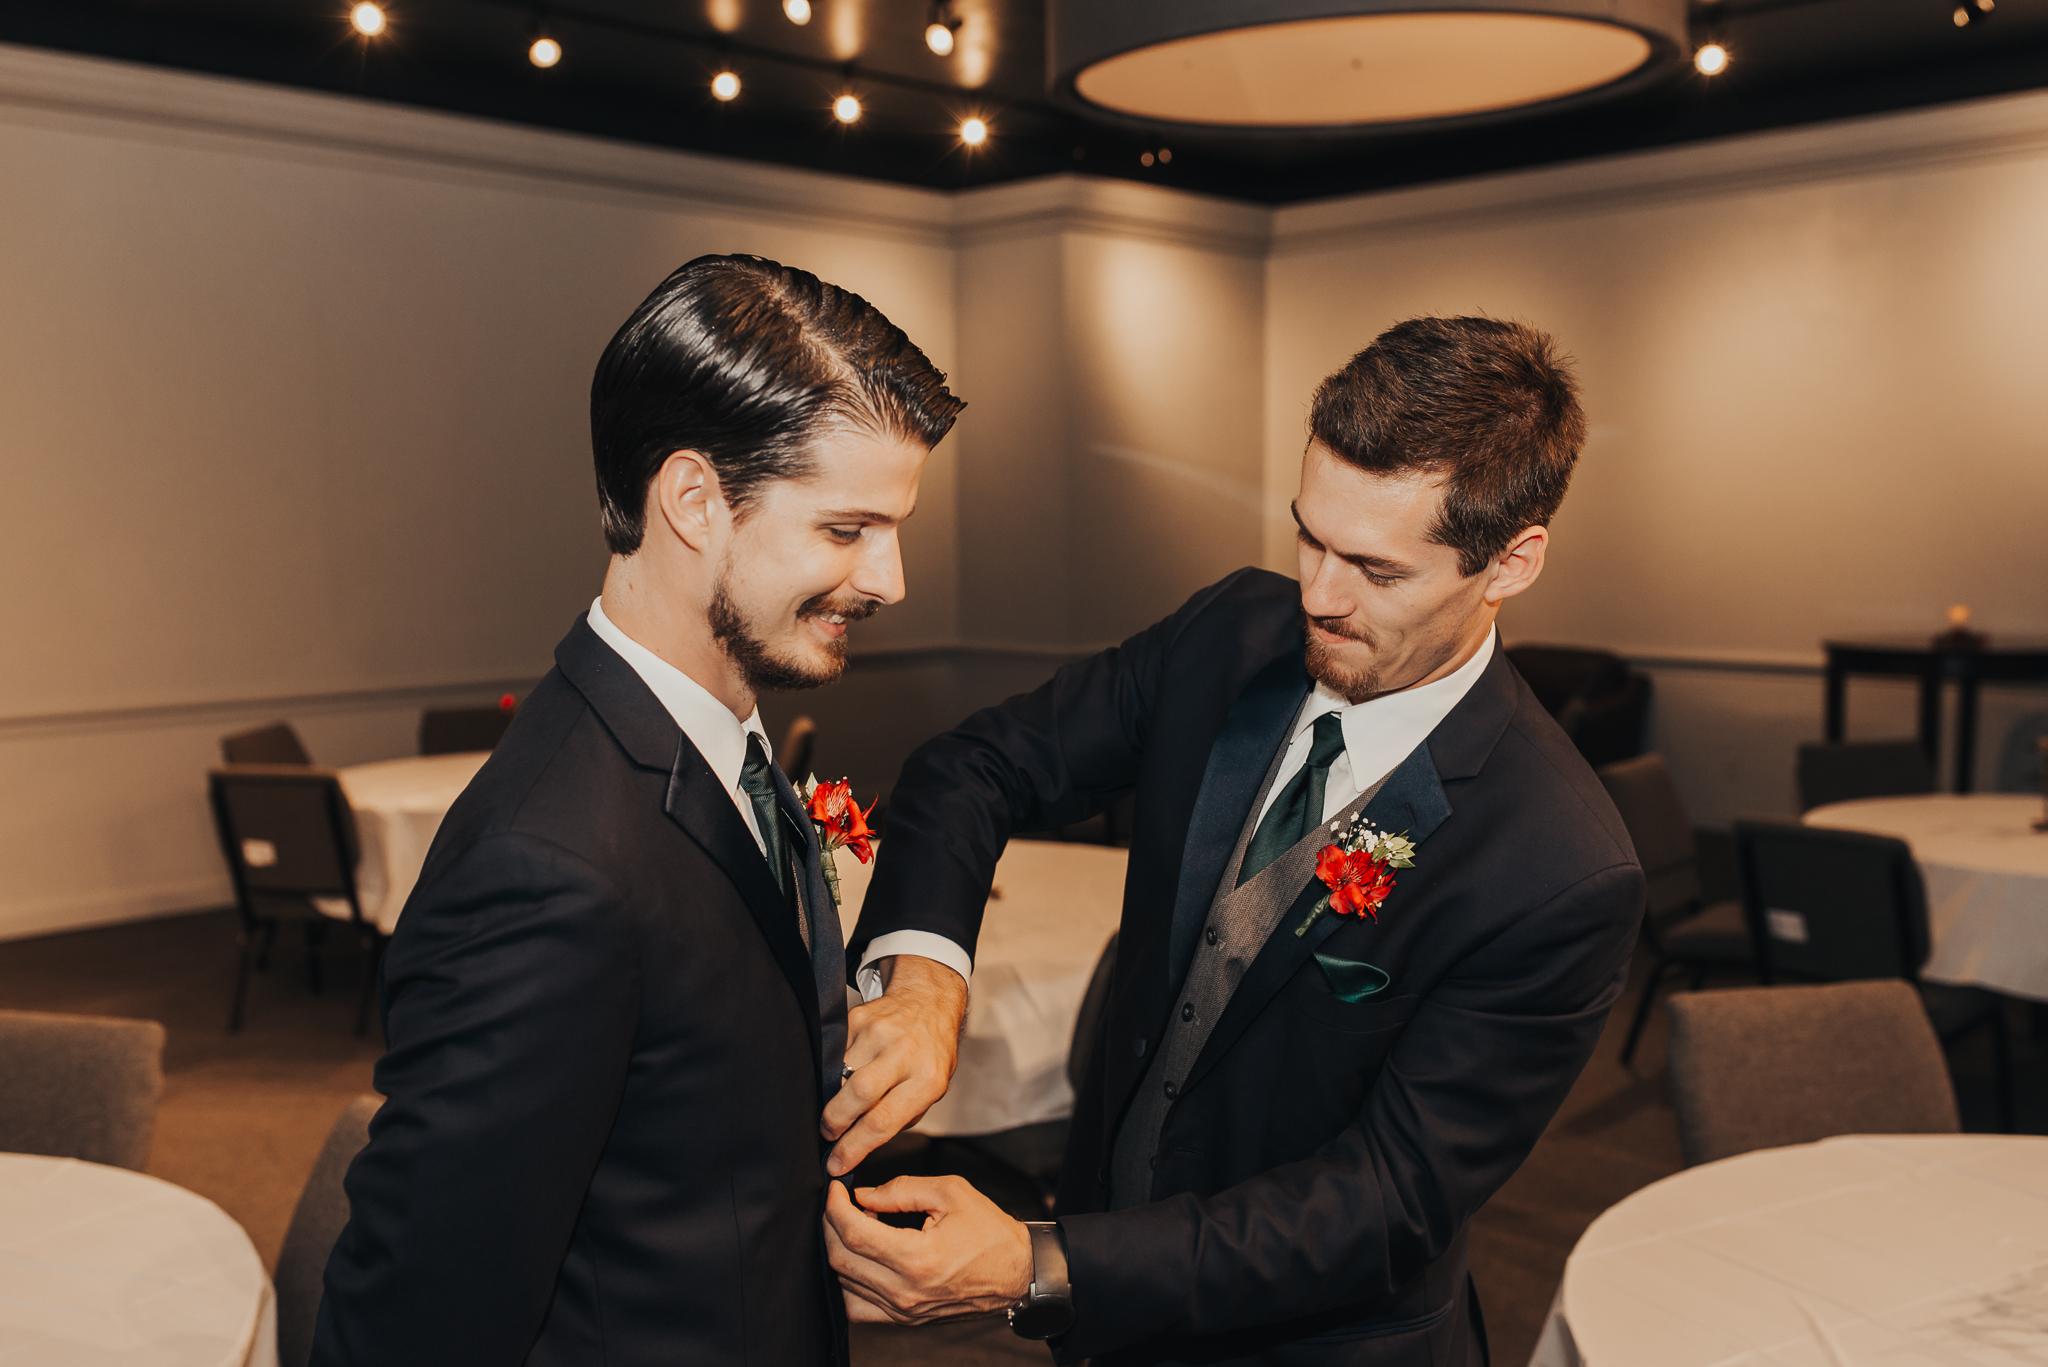 Wedding-Party-21.JPG